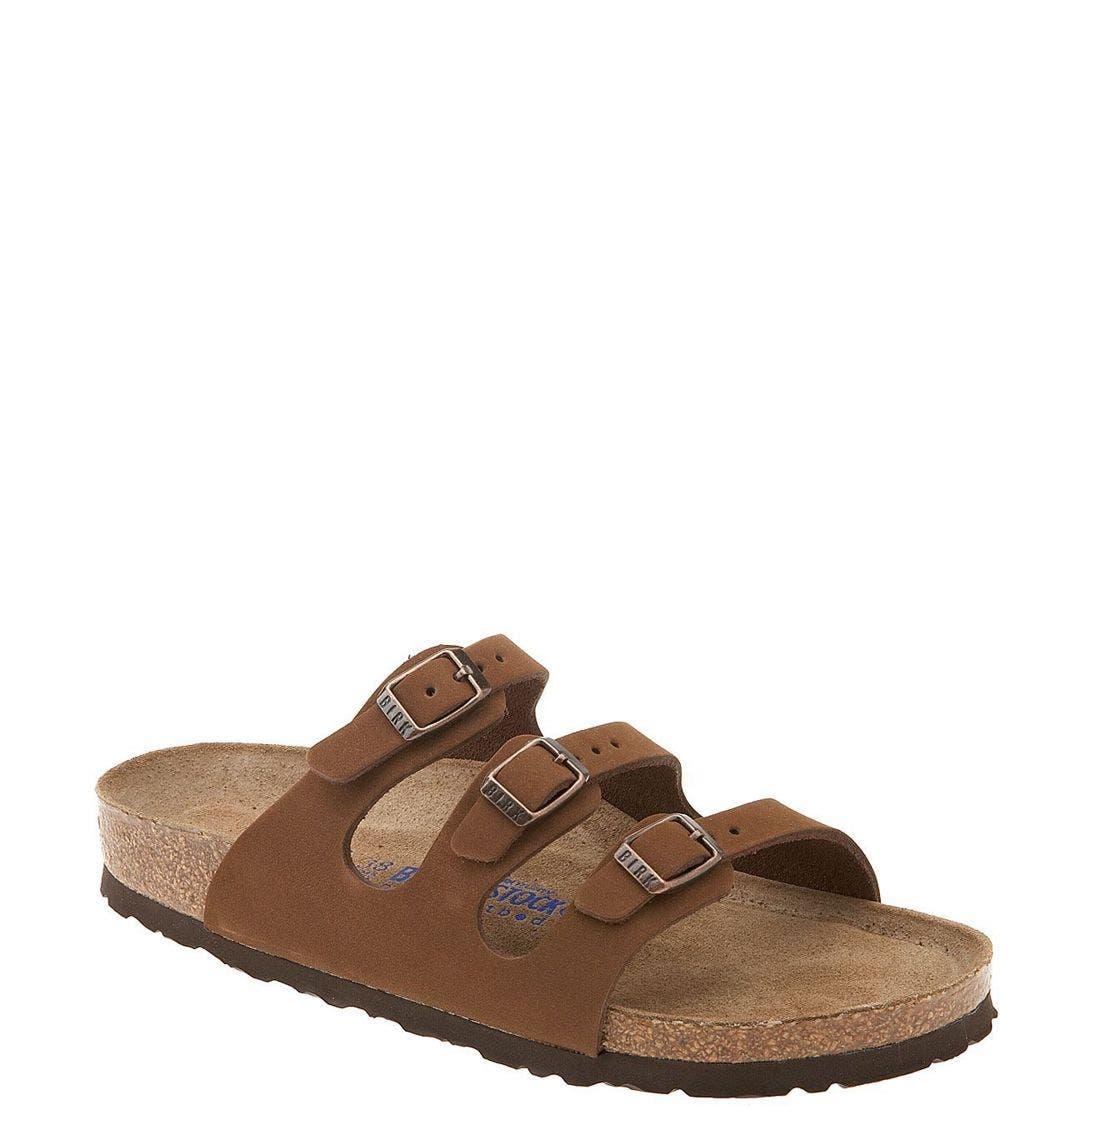 'Florida' Soft Footbed Sandal,                             Main thumbnail 1, color,                             Cocoa Nubuck